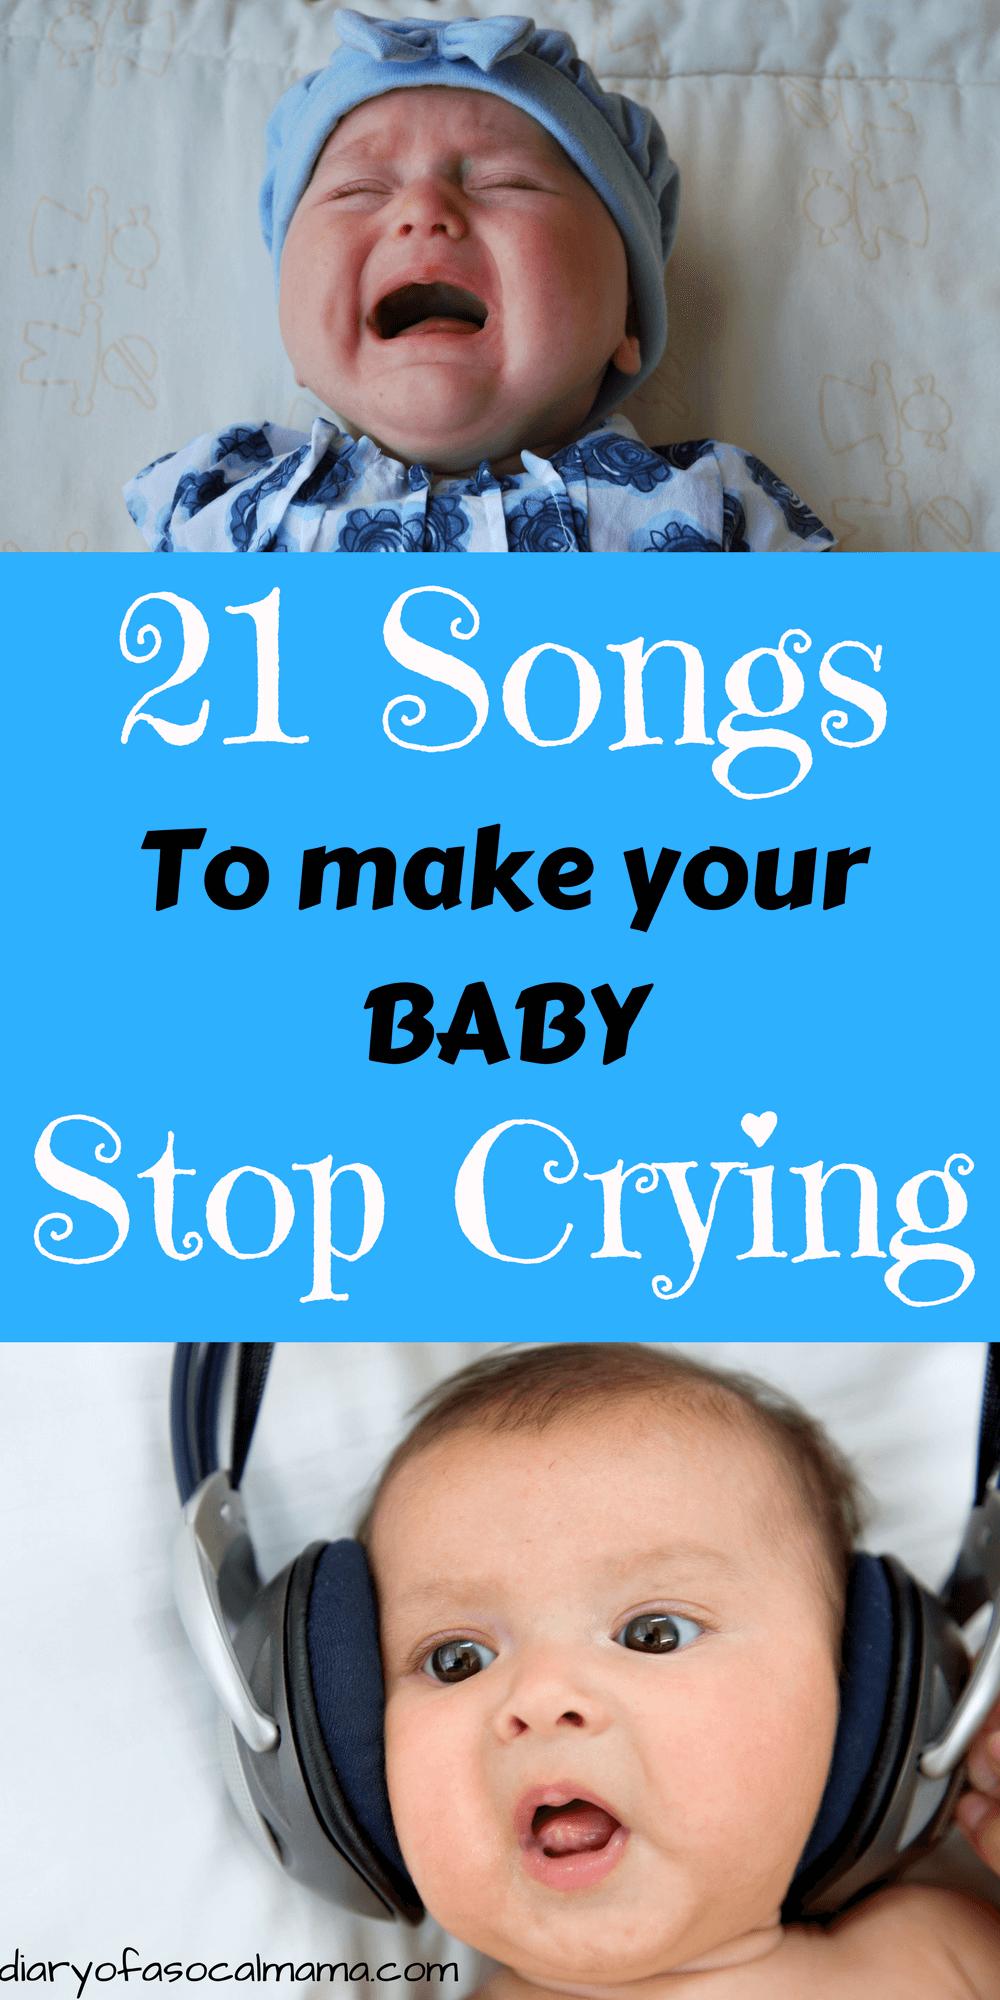 3a03f819782c576d399bd8edf13a070c - How To Get A 1 Year Old To Stop Crying